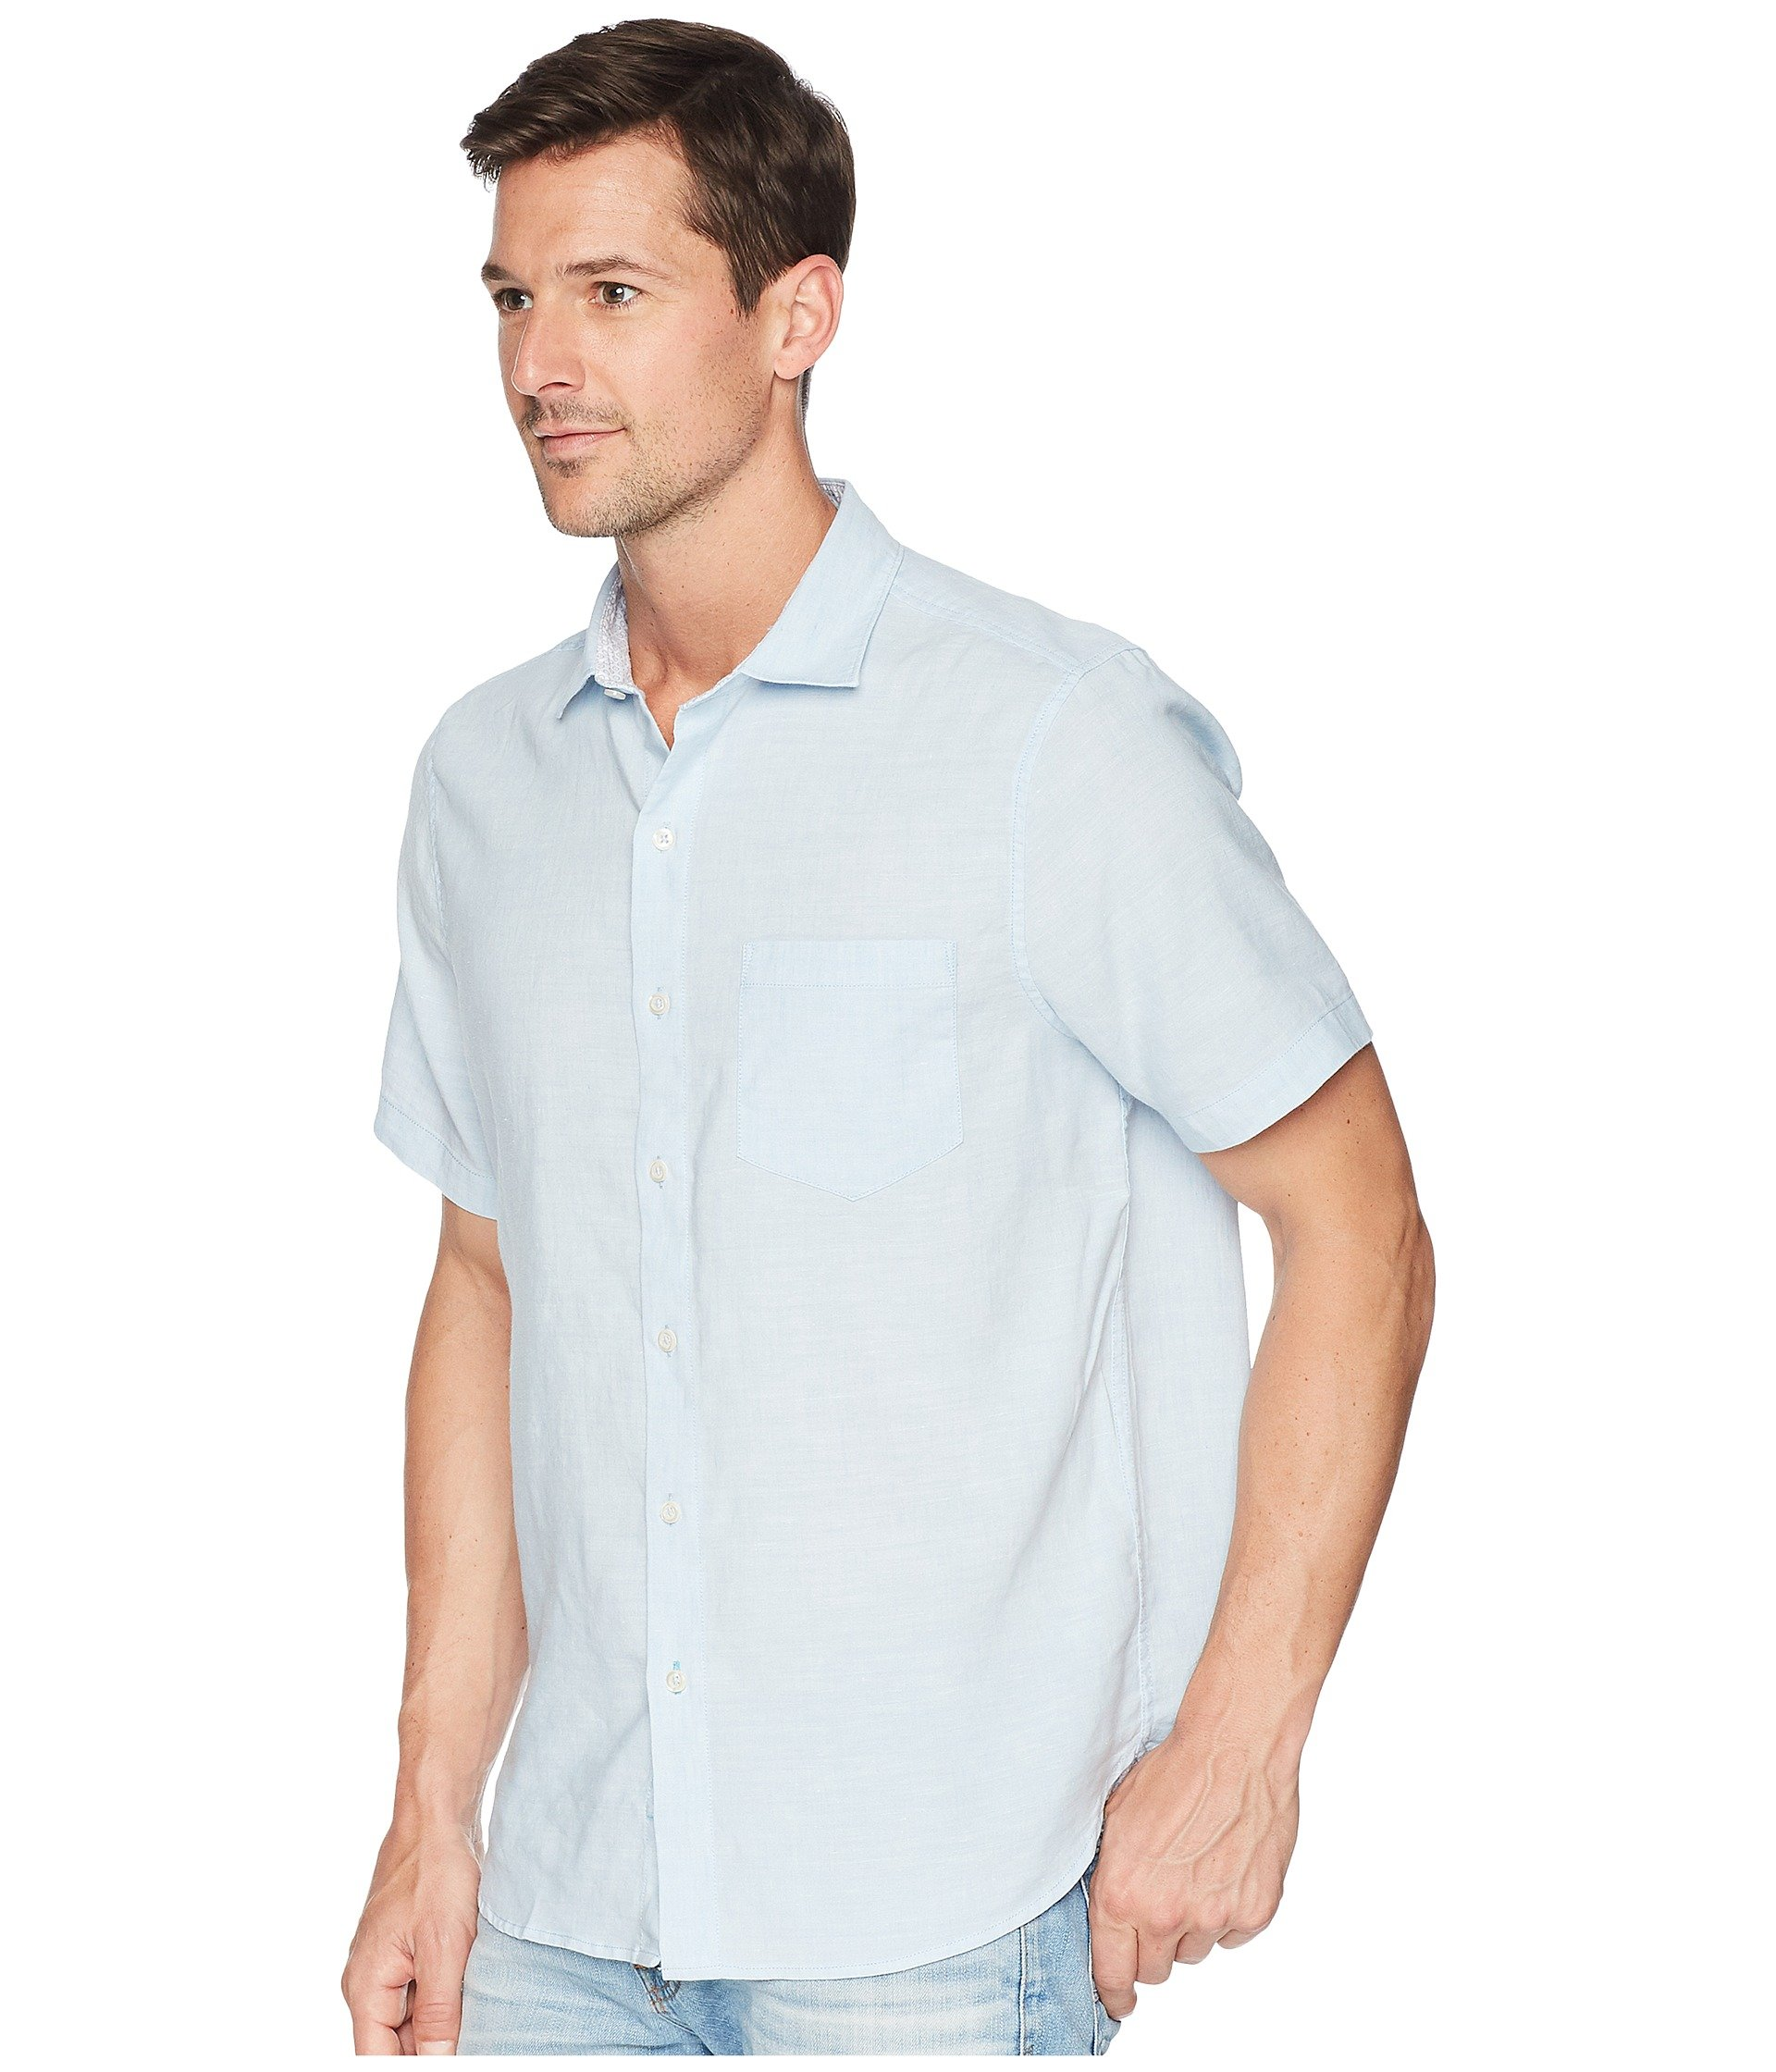 Fresh Short Air Tides Lanai Bahama Linen Tommy Shirt Sleeve 6qw0TZ